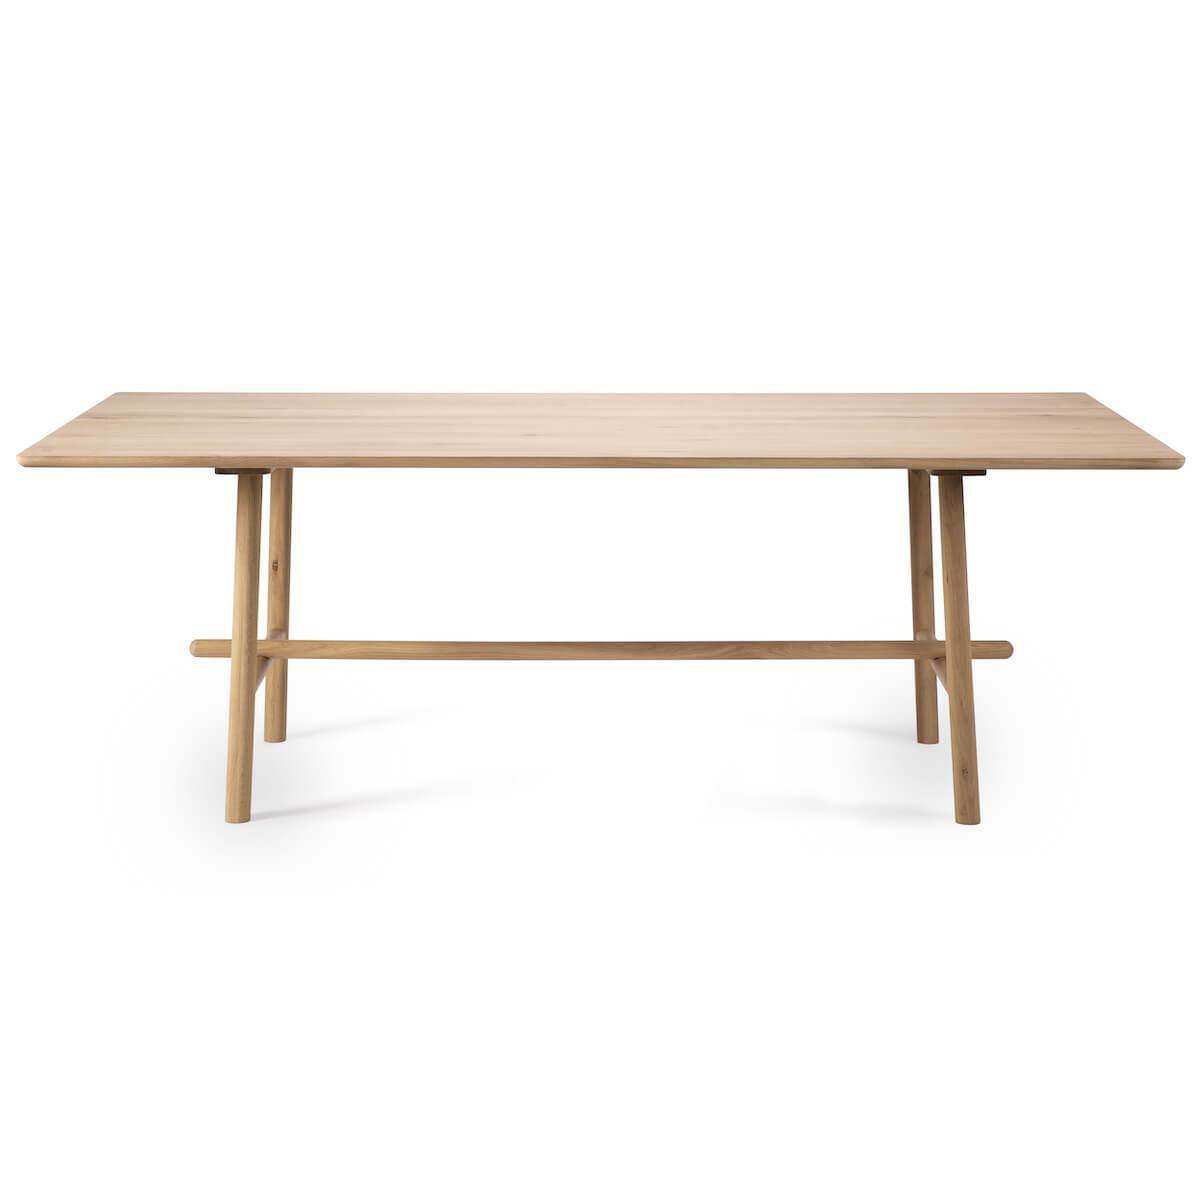 Table 100x200cm PROFILE Ethnicraft chêne